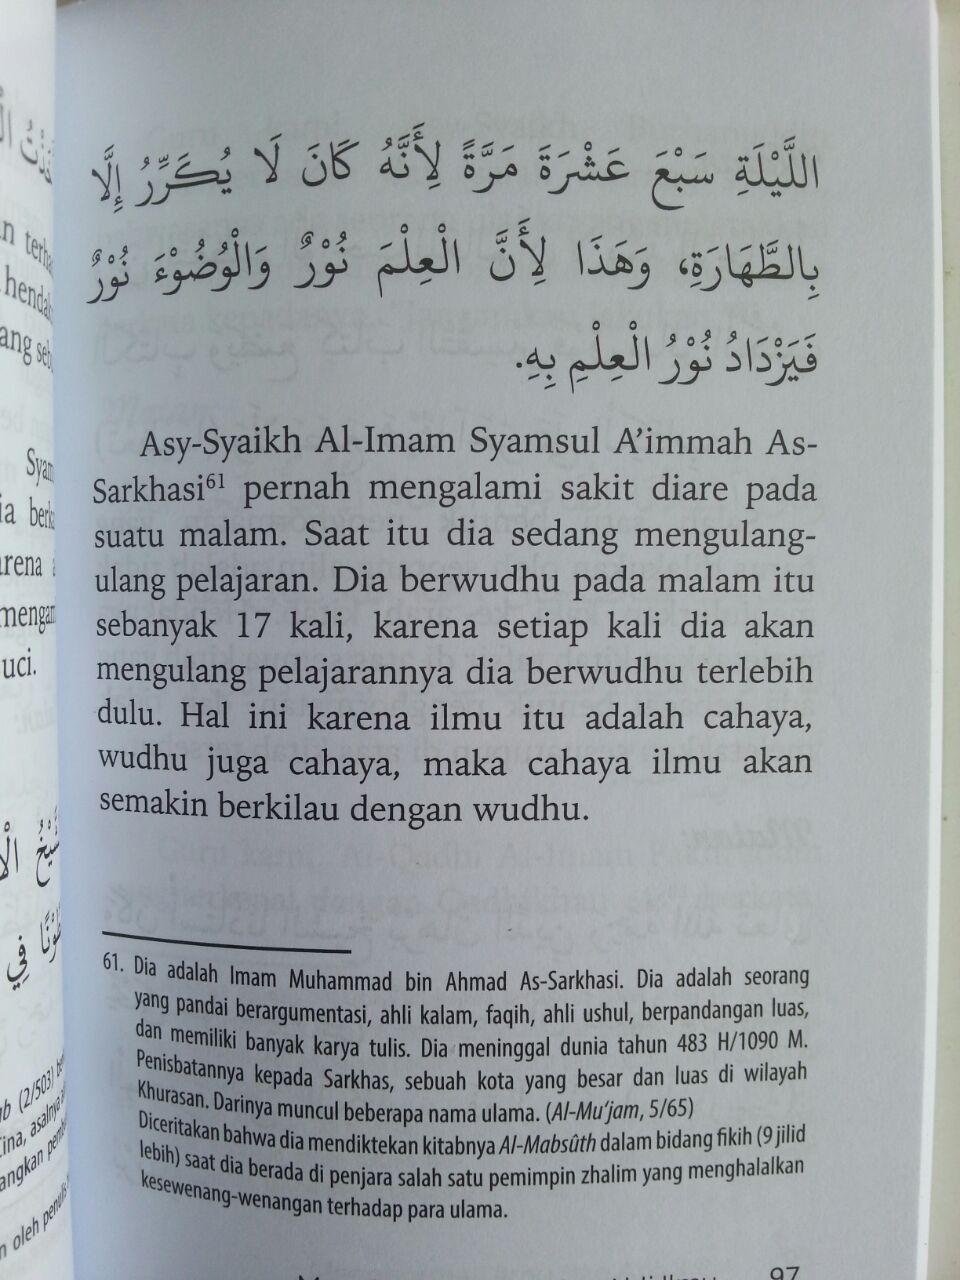 Buku Ta'lim Al-Muta'allim Wasiat Terkait Adab Akhlak Menuntut Ilmu isi 3